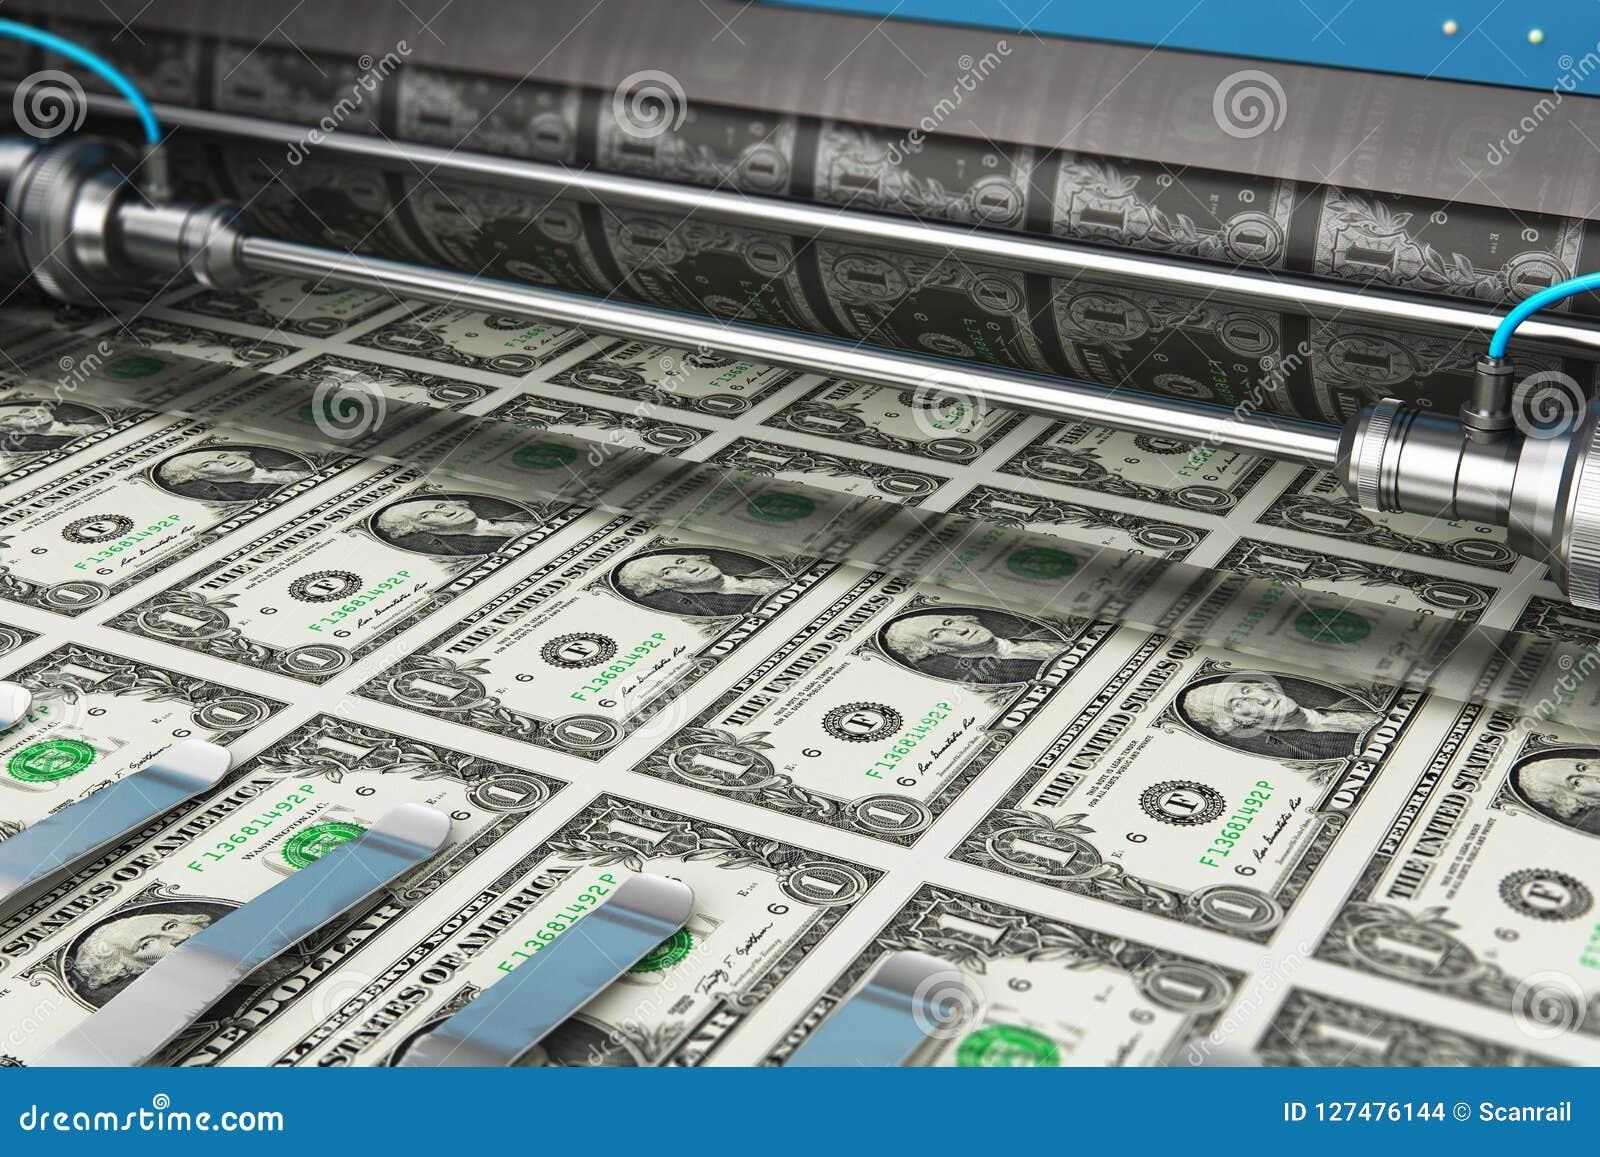 Printing 1 US Dollar USD Money Banknotes Stock Illustration